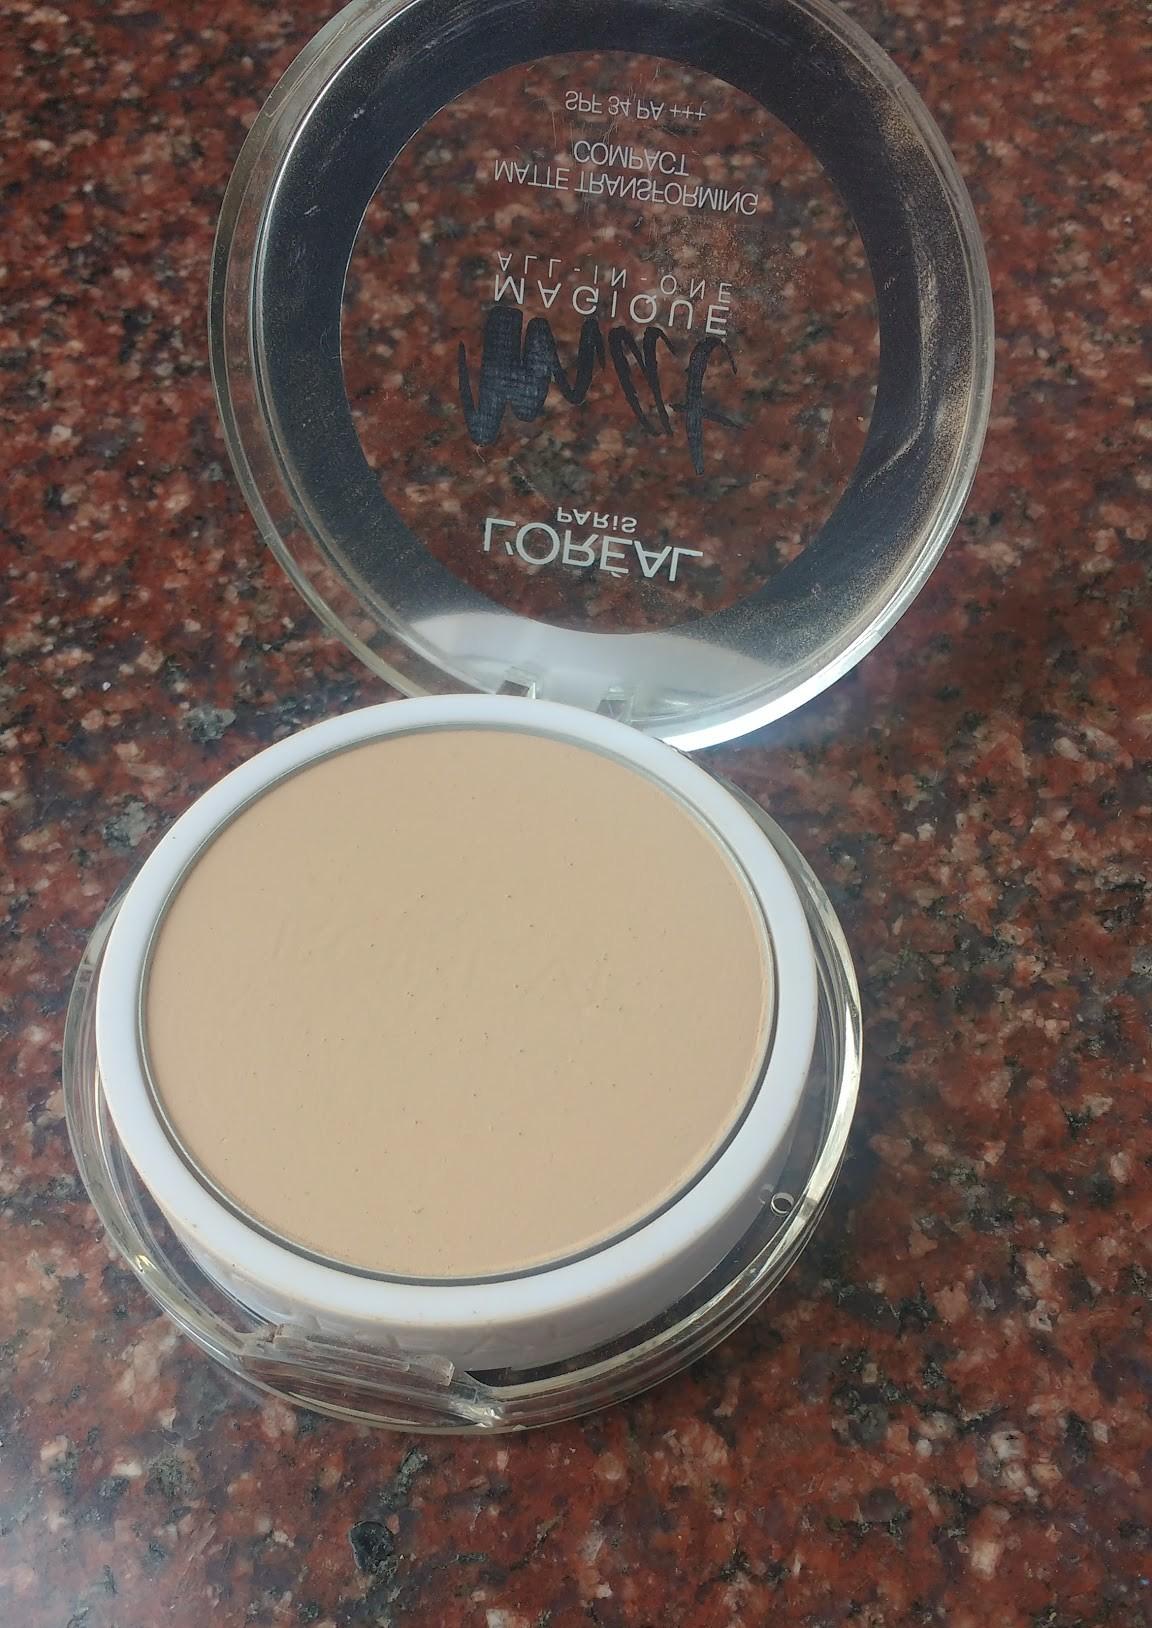 Best compact powder foundation